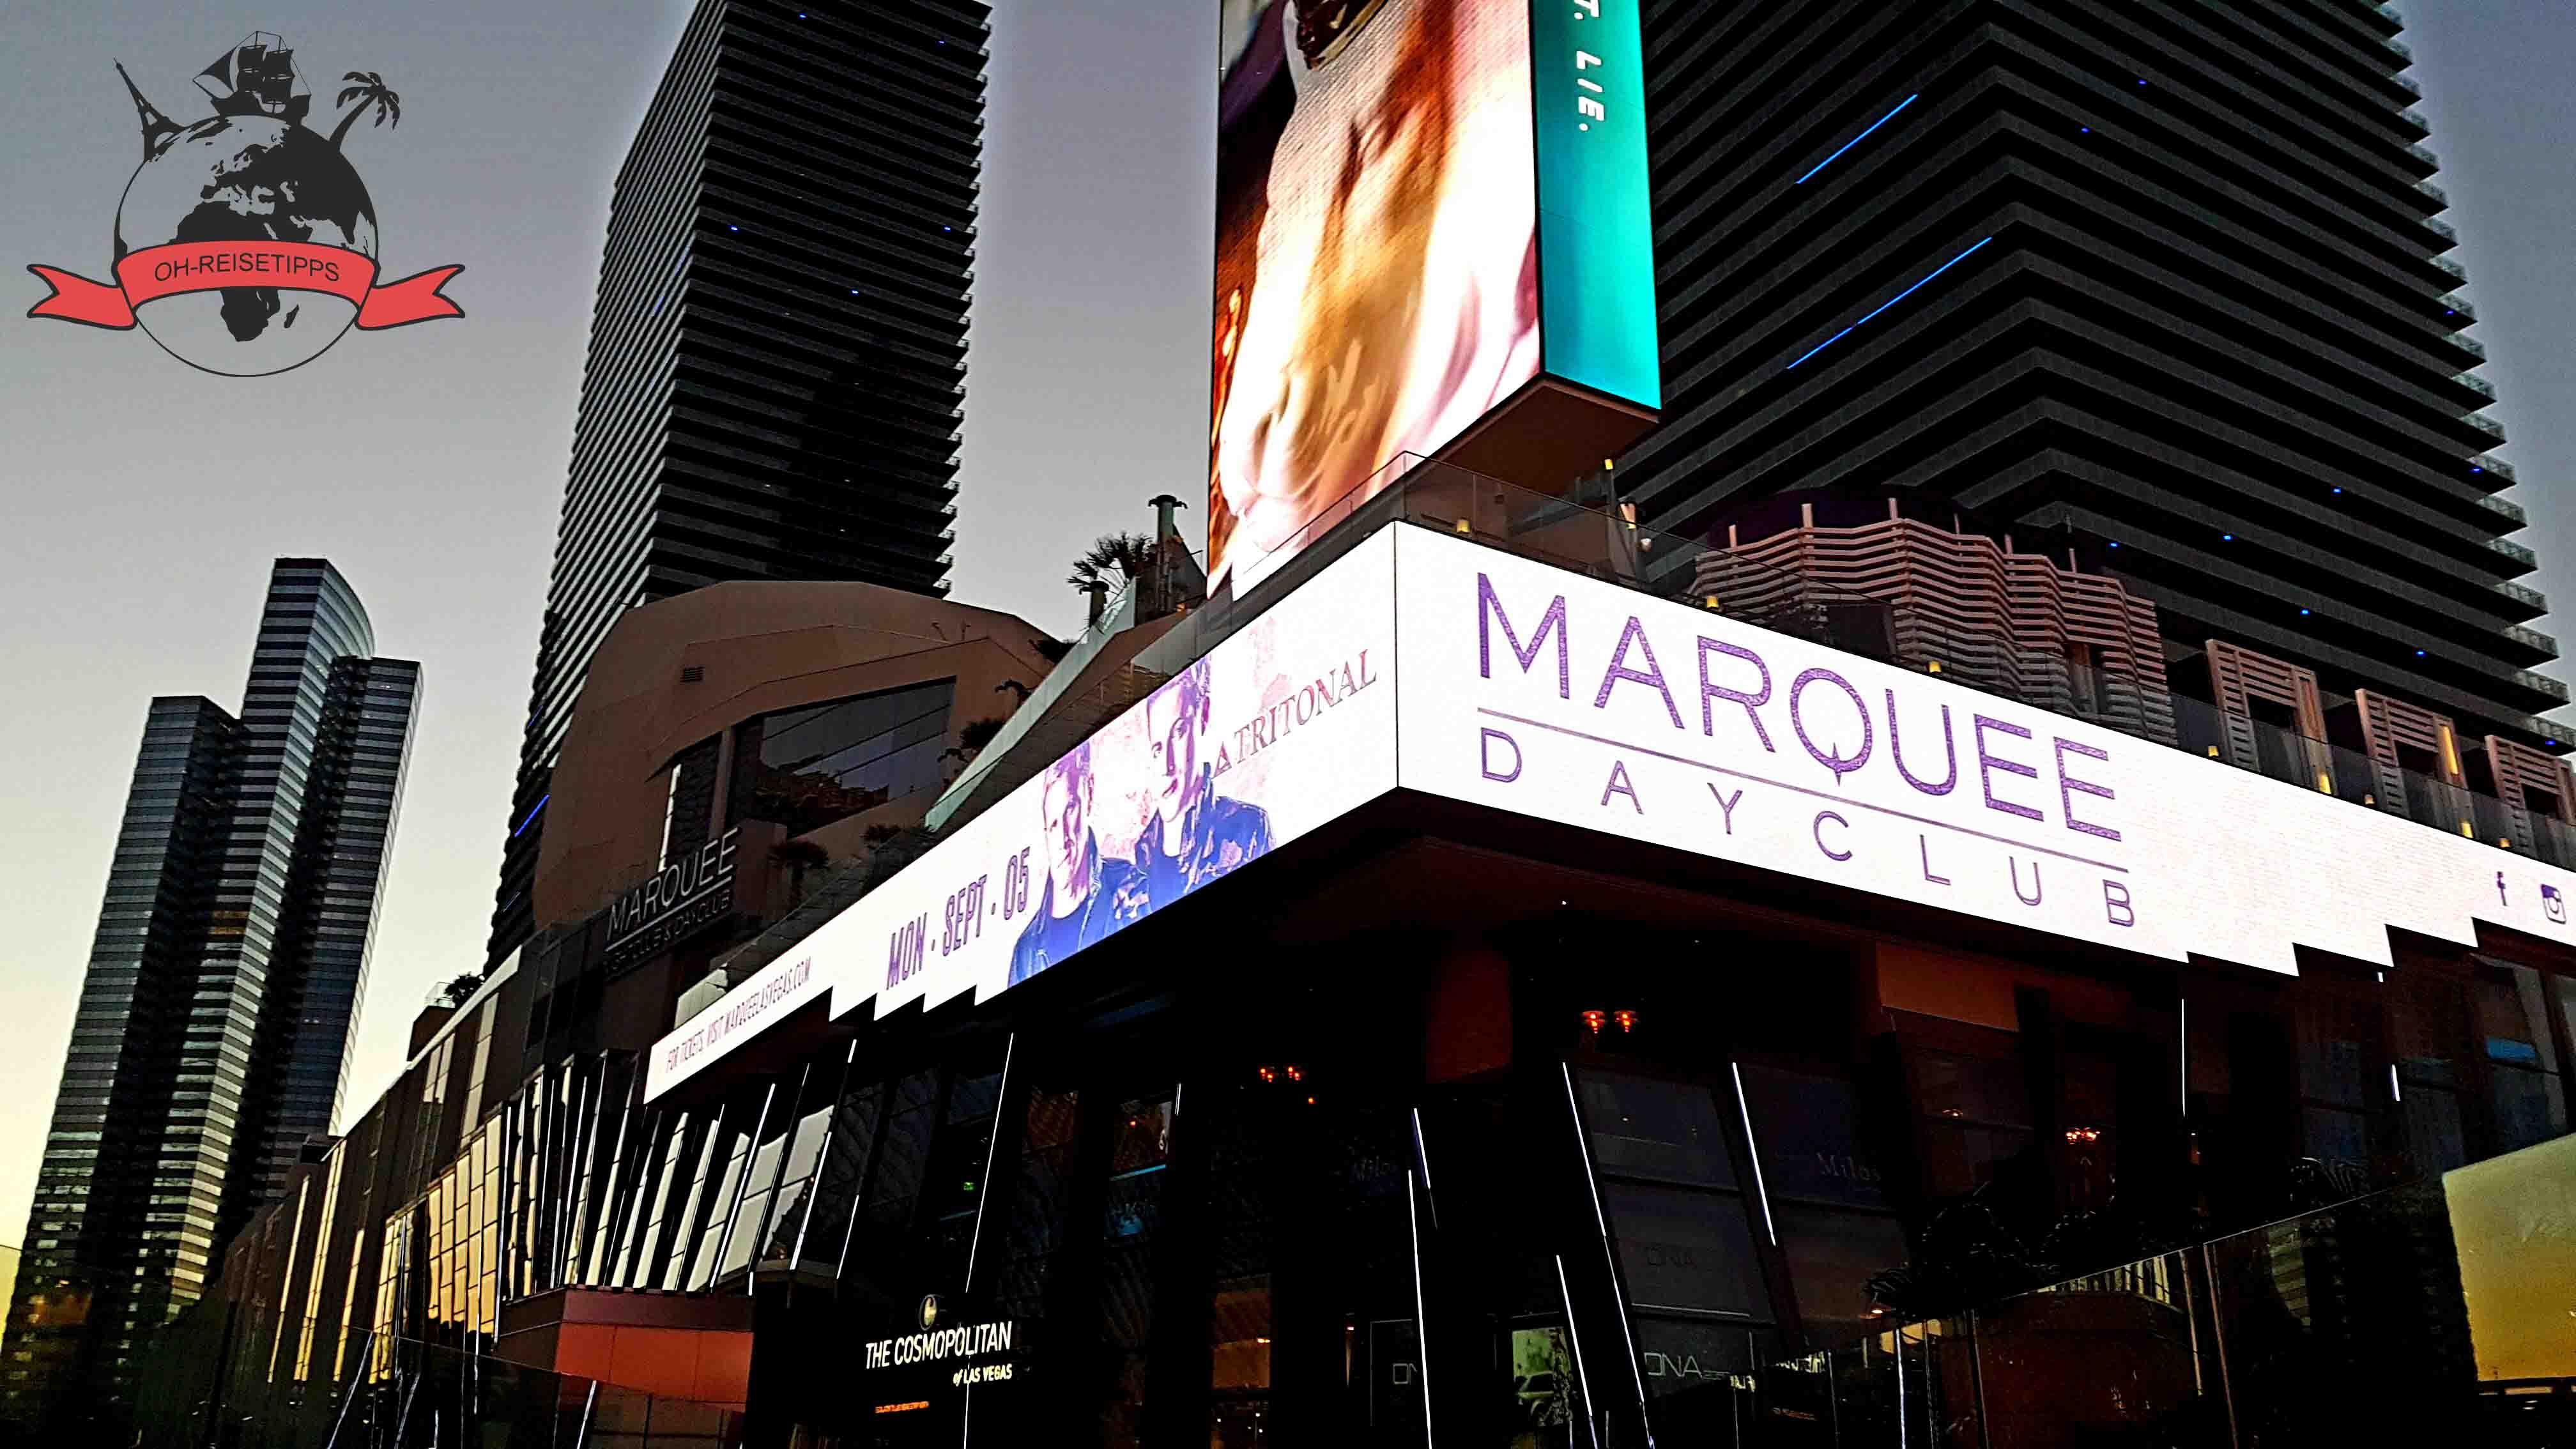 lasvegas-marquee-dayclub